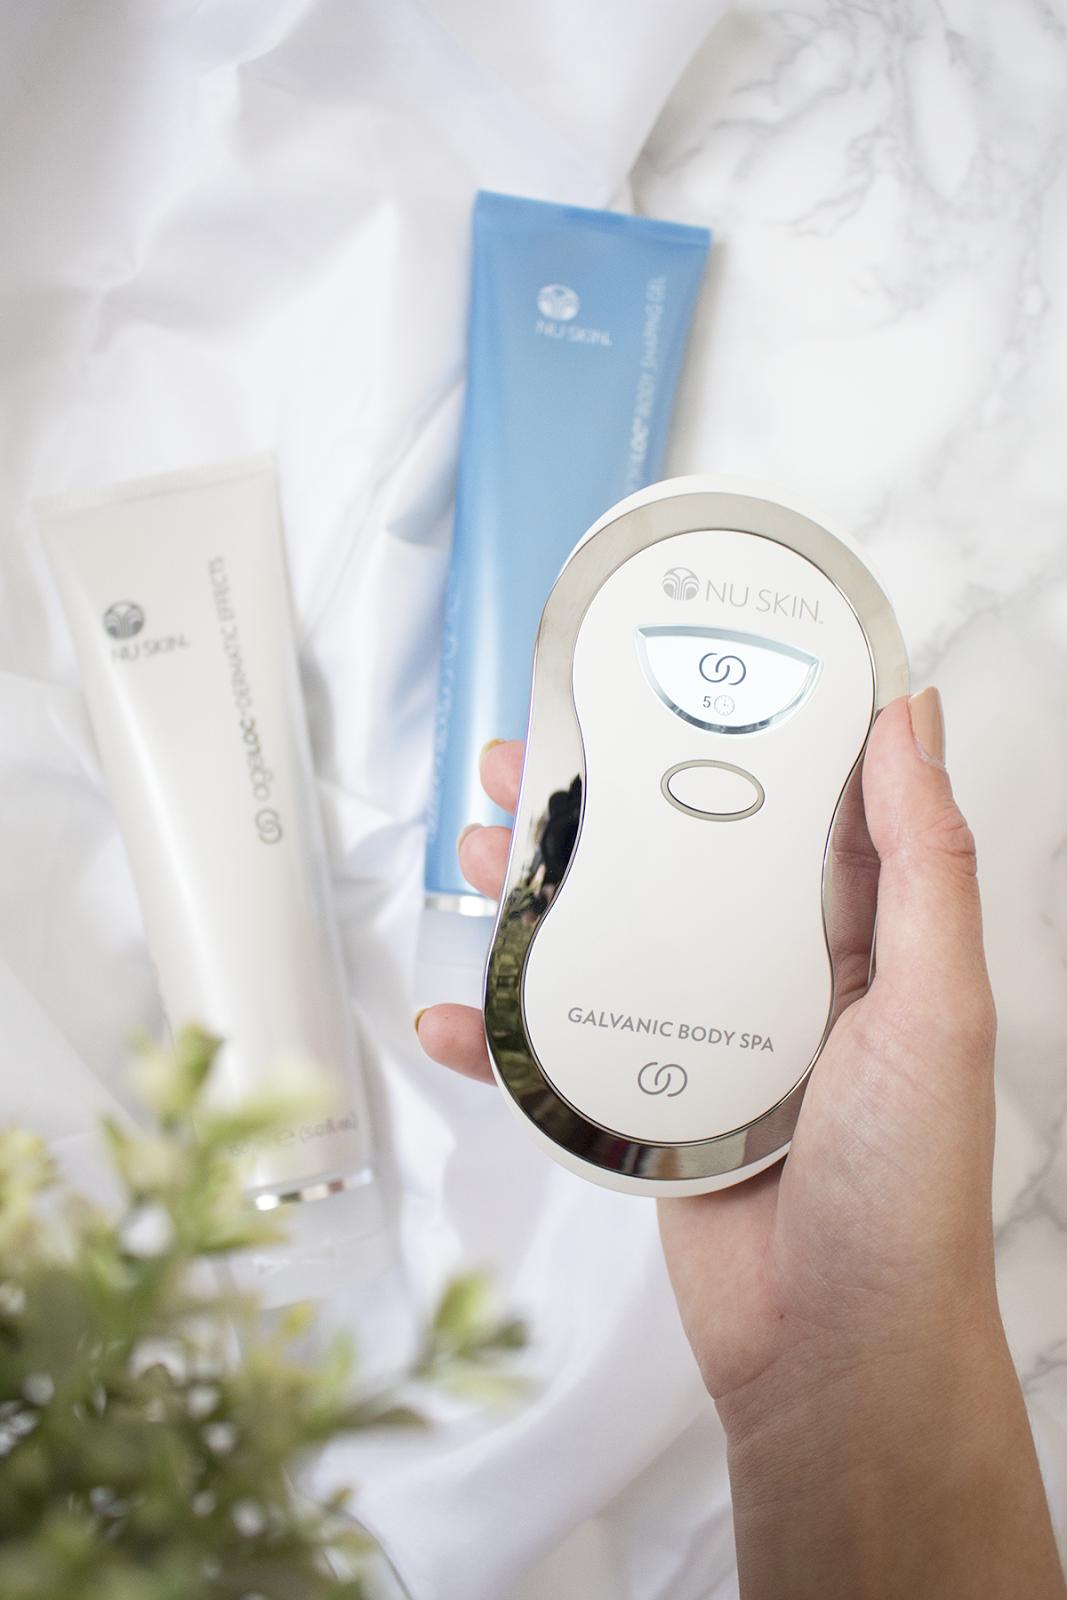 NU SKIN | Galvanic Body Spa | Chedsneh | insta | Pinterest | Galvanic body spa, Nu skin and Body spa